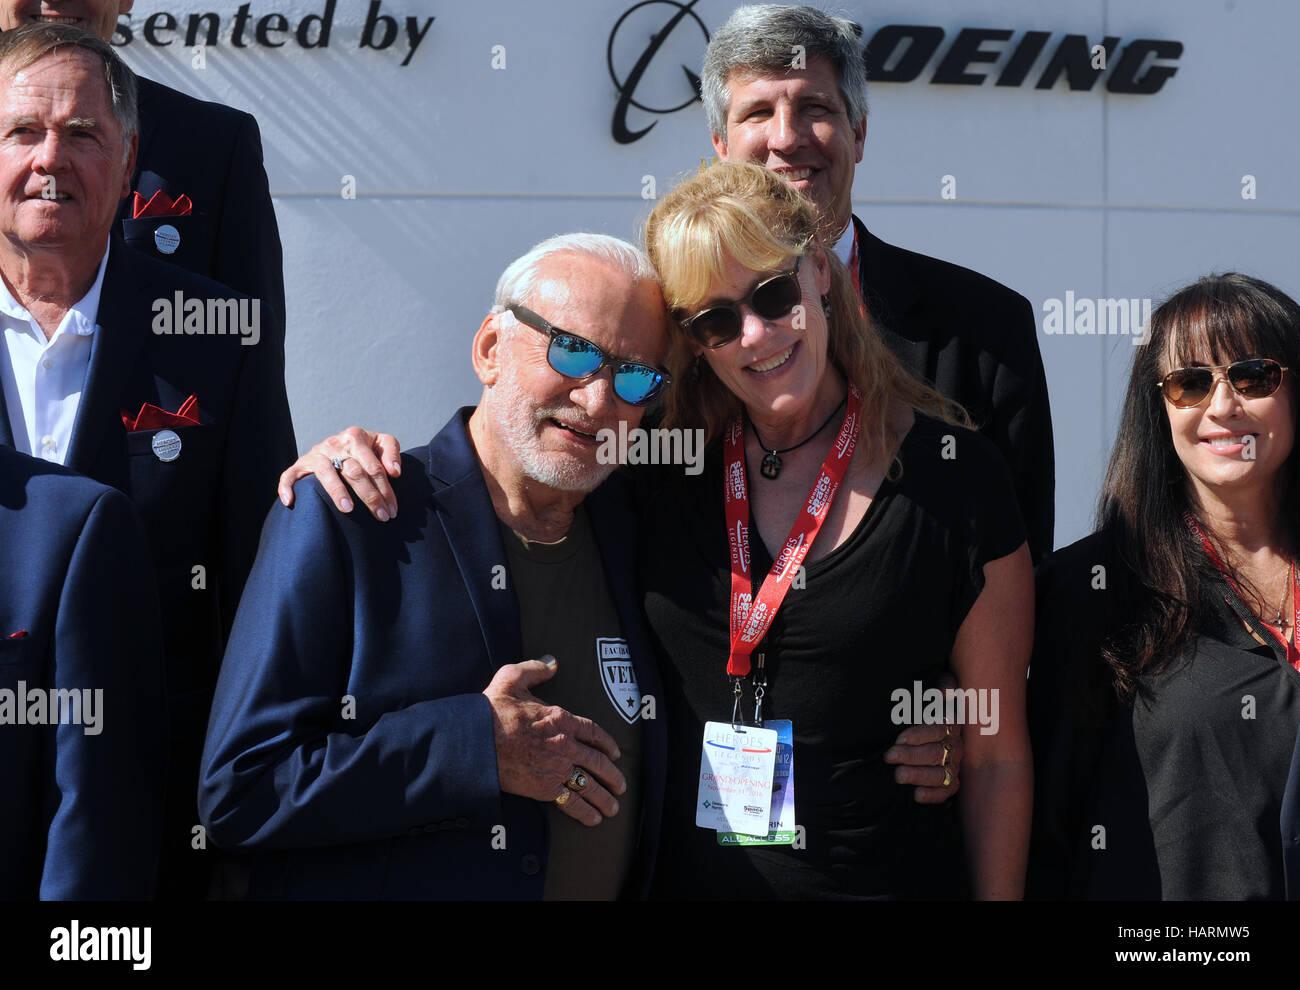 November 11, 2016 - Titusville, Florida, United States - Former astronaut Buzz Aldrin (center left), accompanied - Stock Image